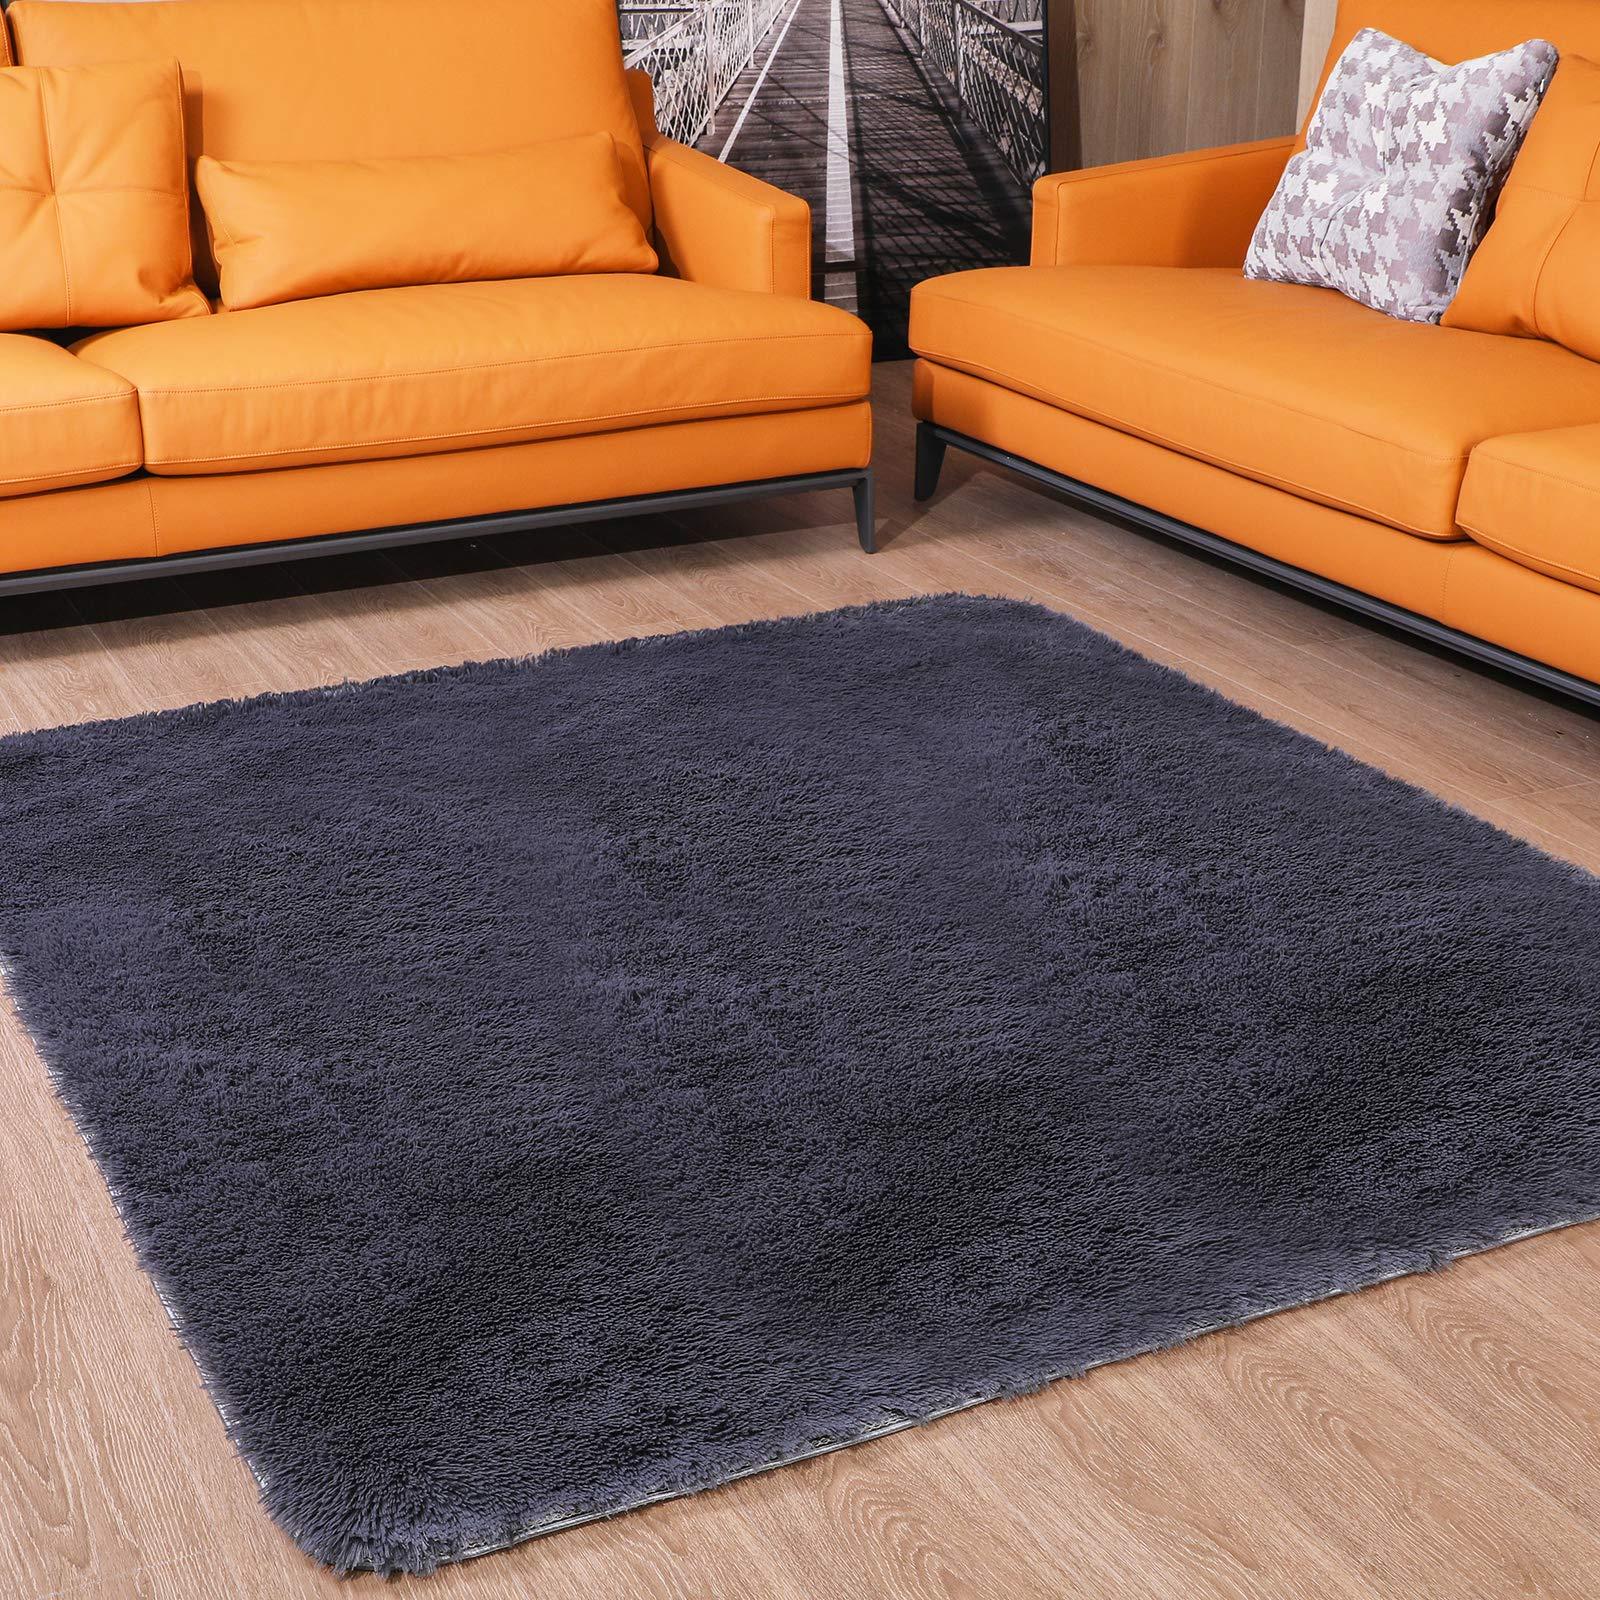 Soft Shag Rug Comfy Grey Shaggy Rug for Bedroom Fluffy Area Rugs